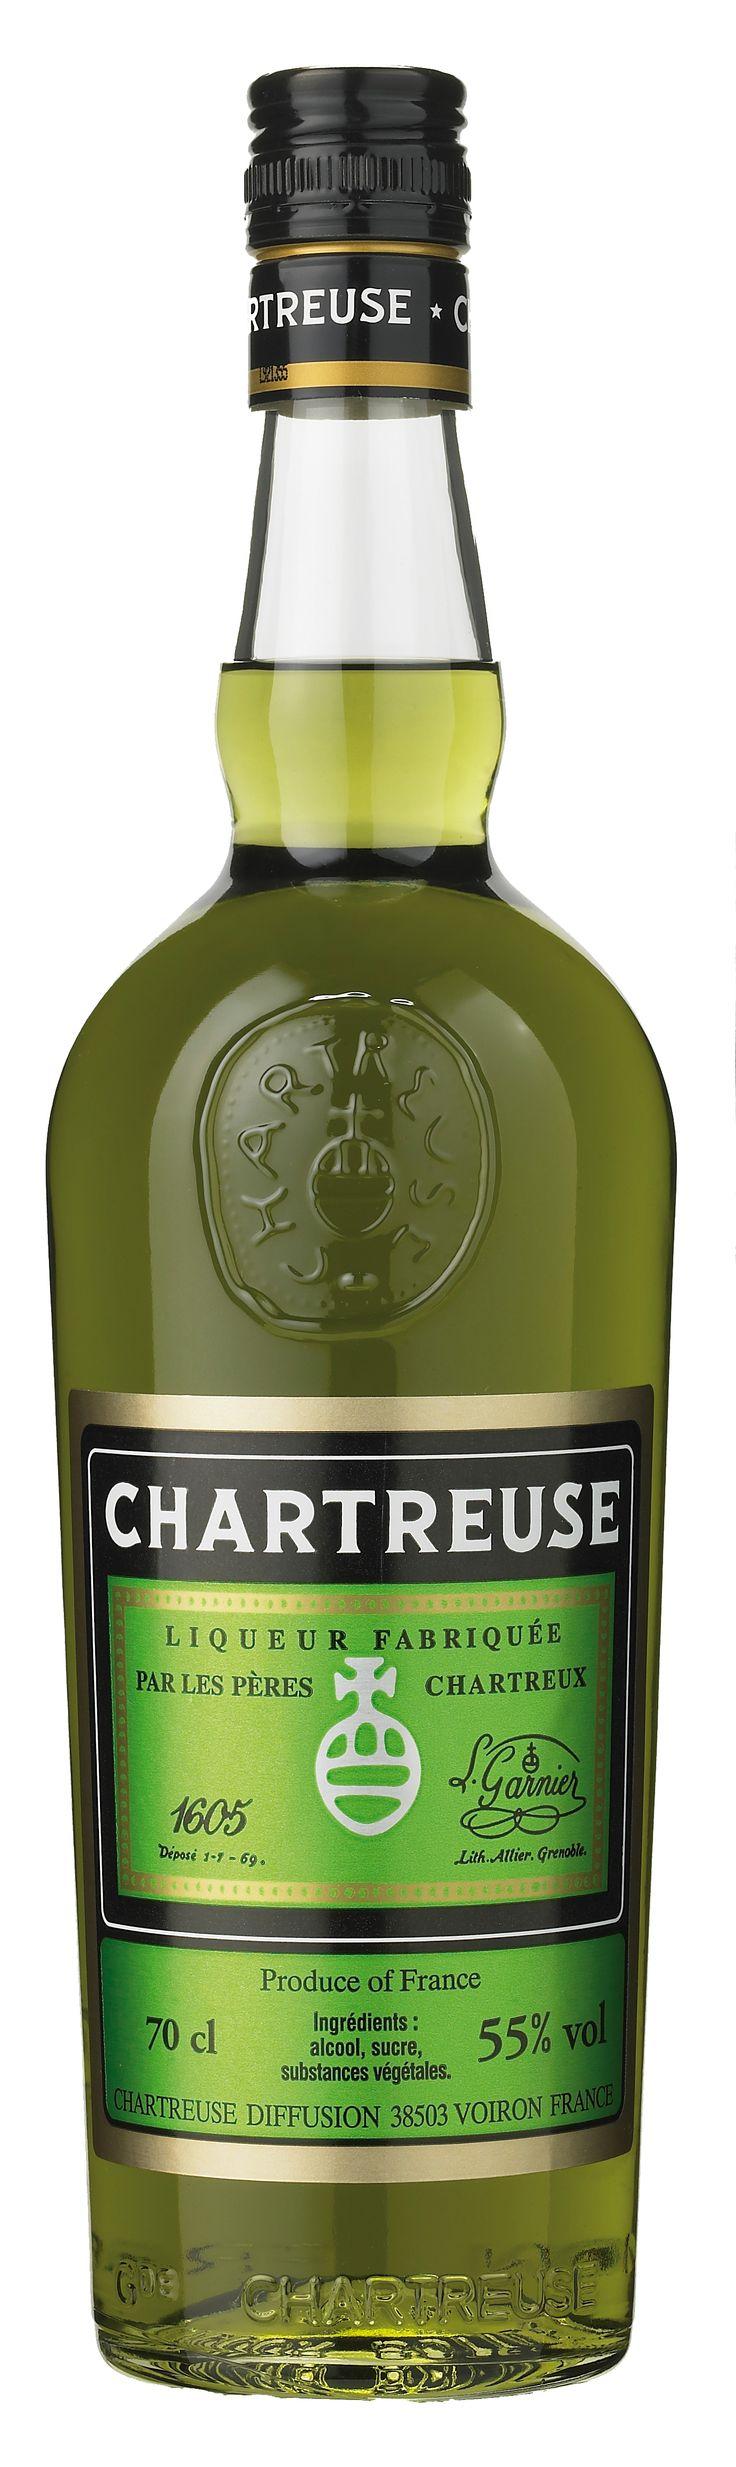 Collection12 features: Chartreuse Liqueur